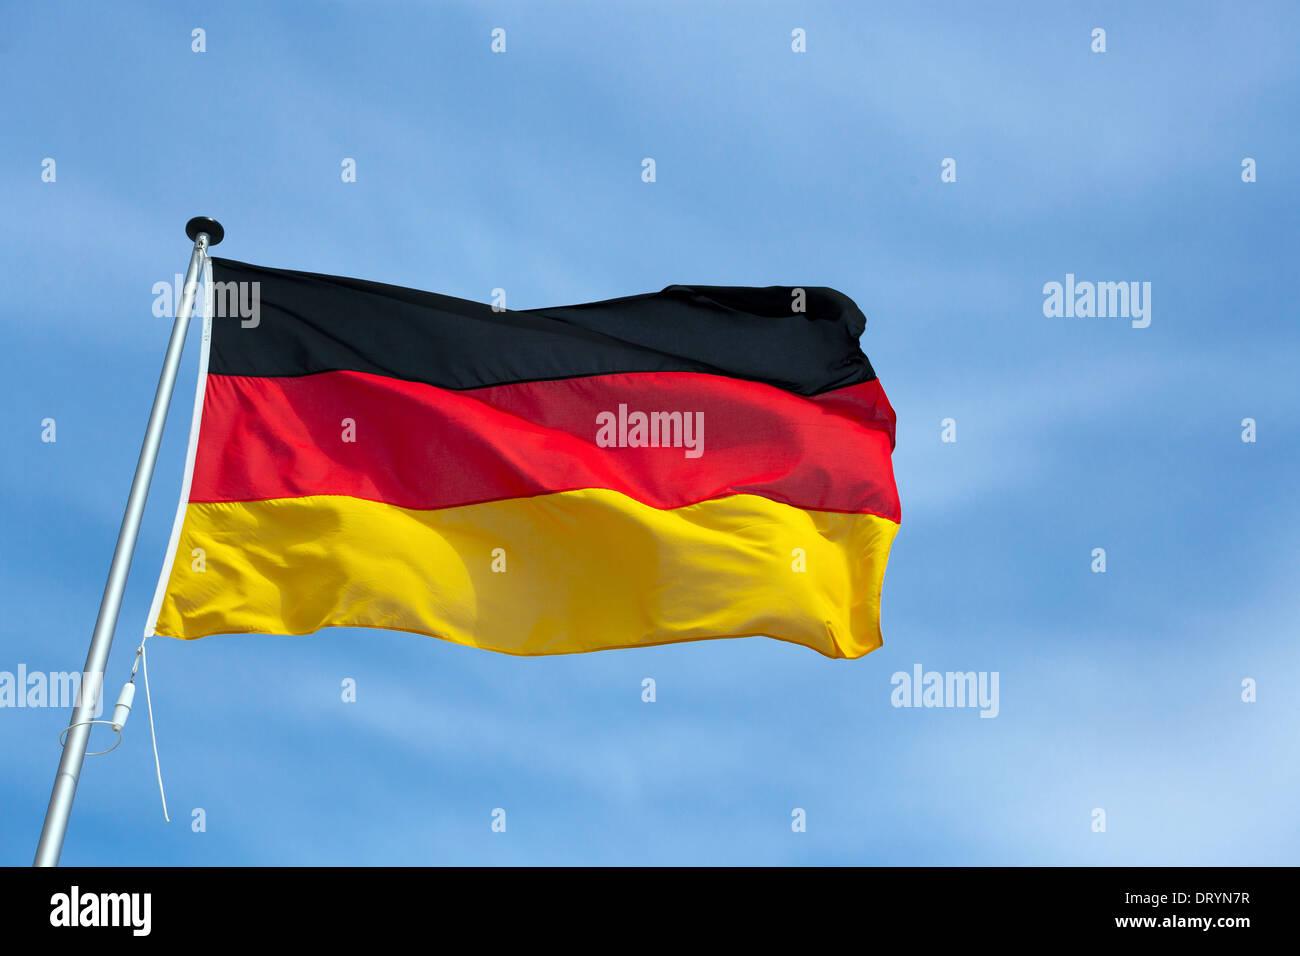 Germany - Stock Image